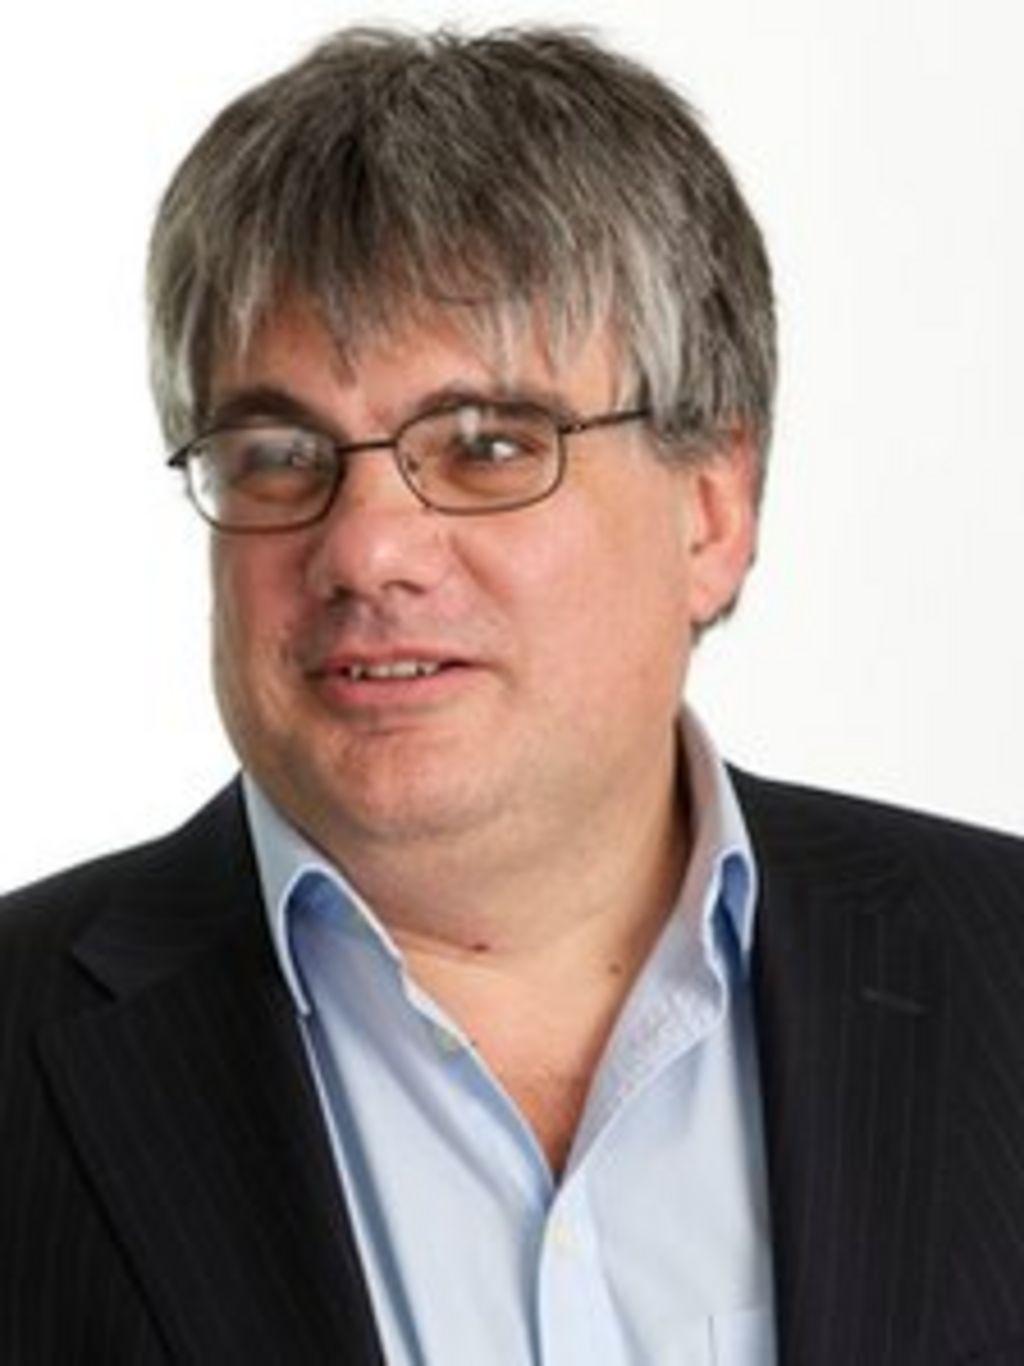 Ian Marchant (businessman) httpsichef1bbcicouknews1024mediaimages